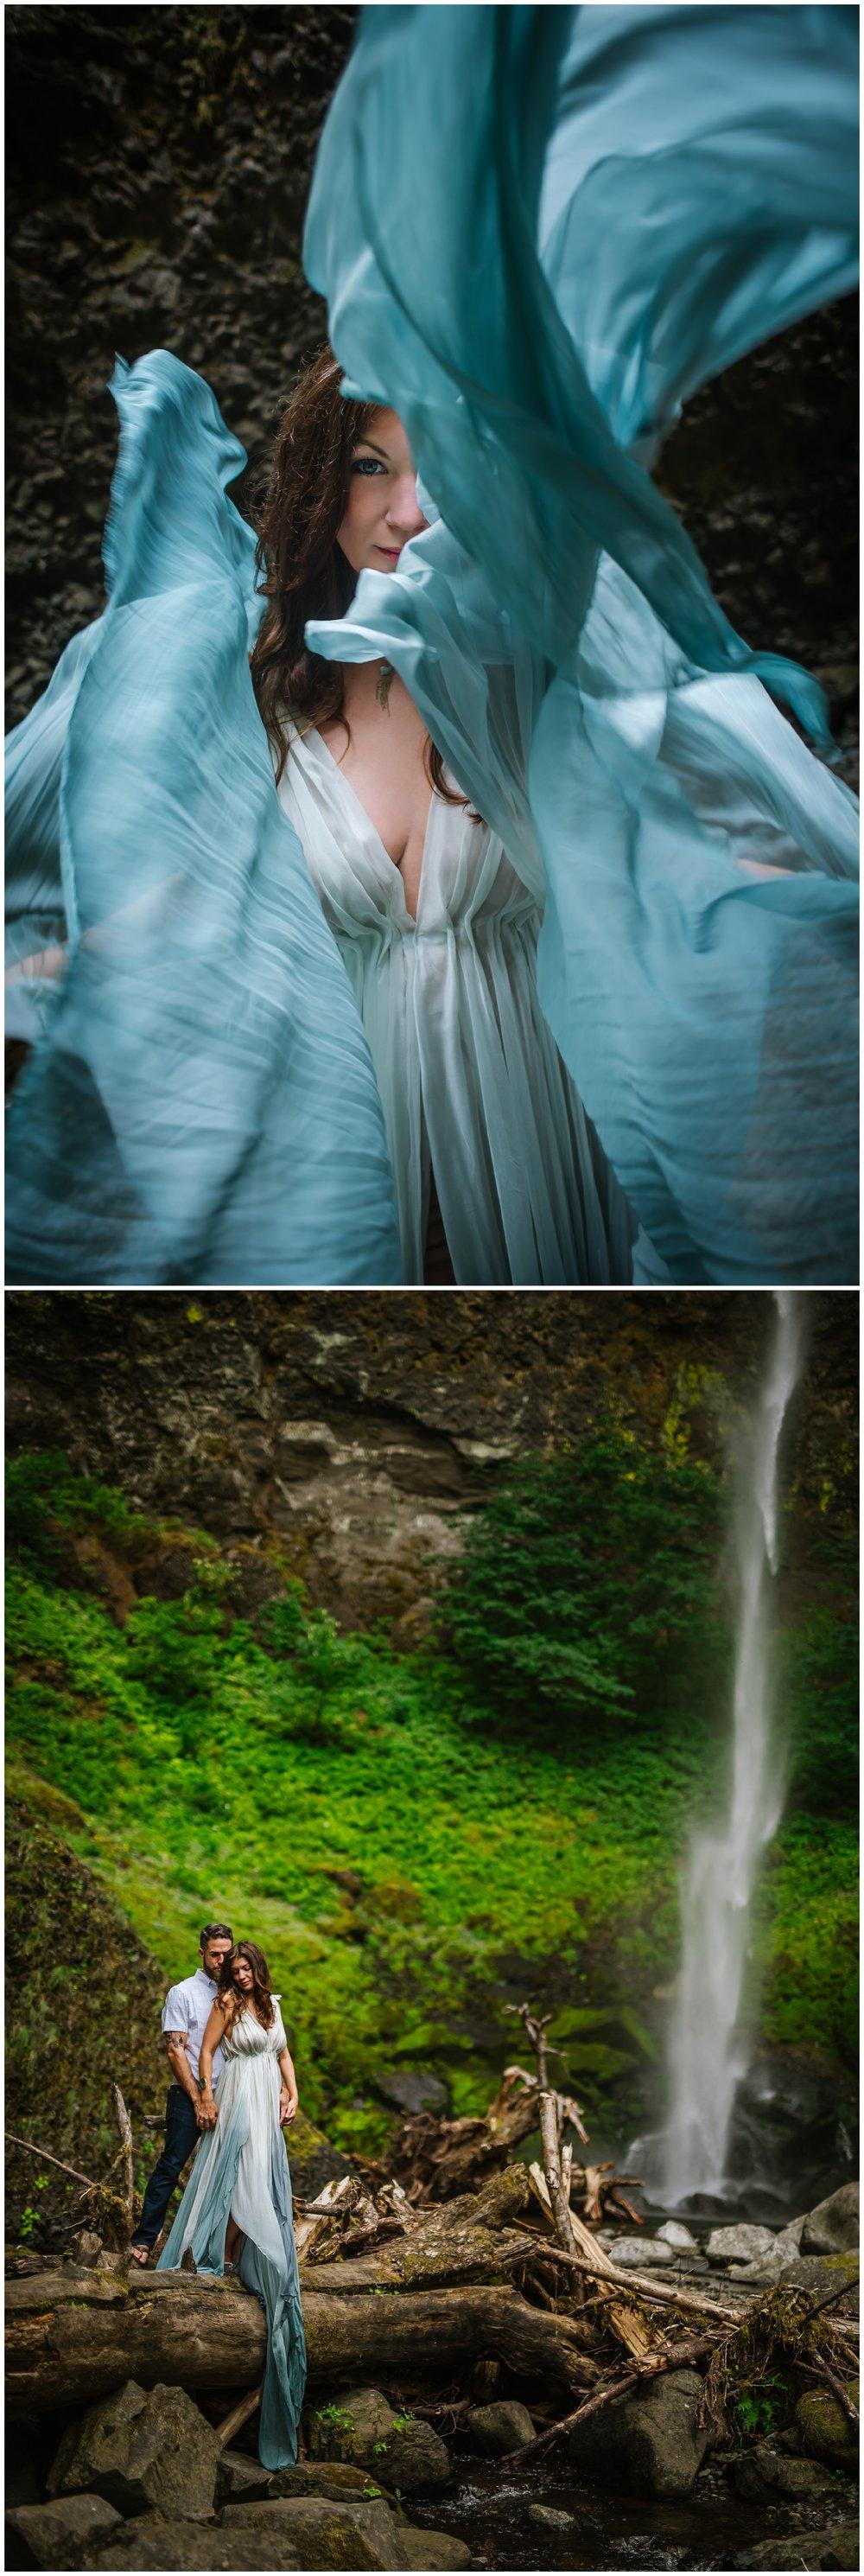 Ashlee-hamon-photography-year-in-review-2016-travel-wanderlust-vsco-adventure-wedding_0039.jpg